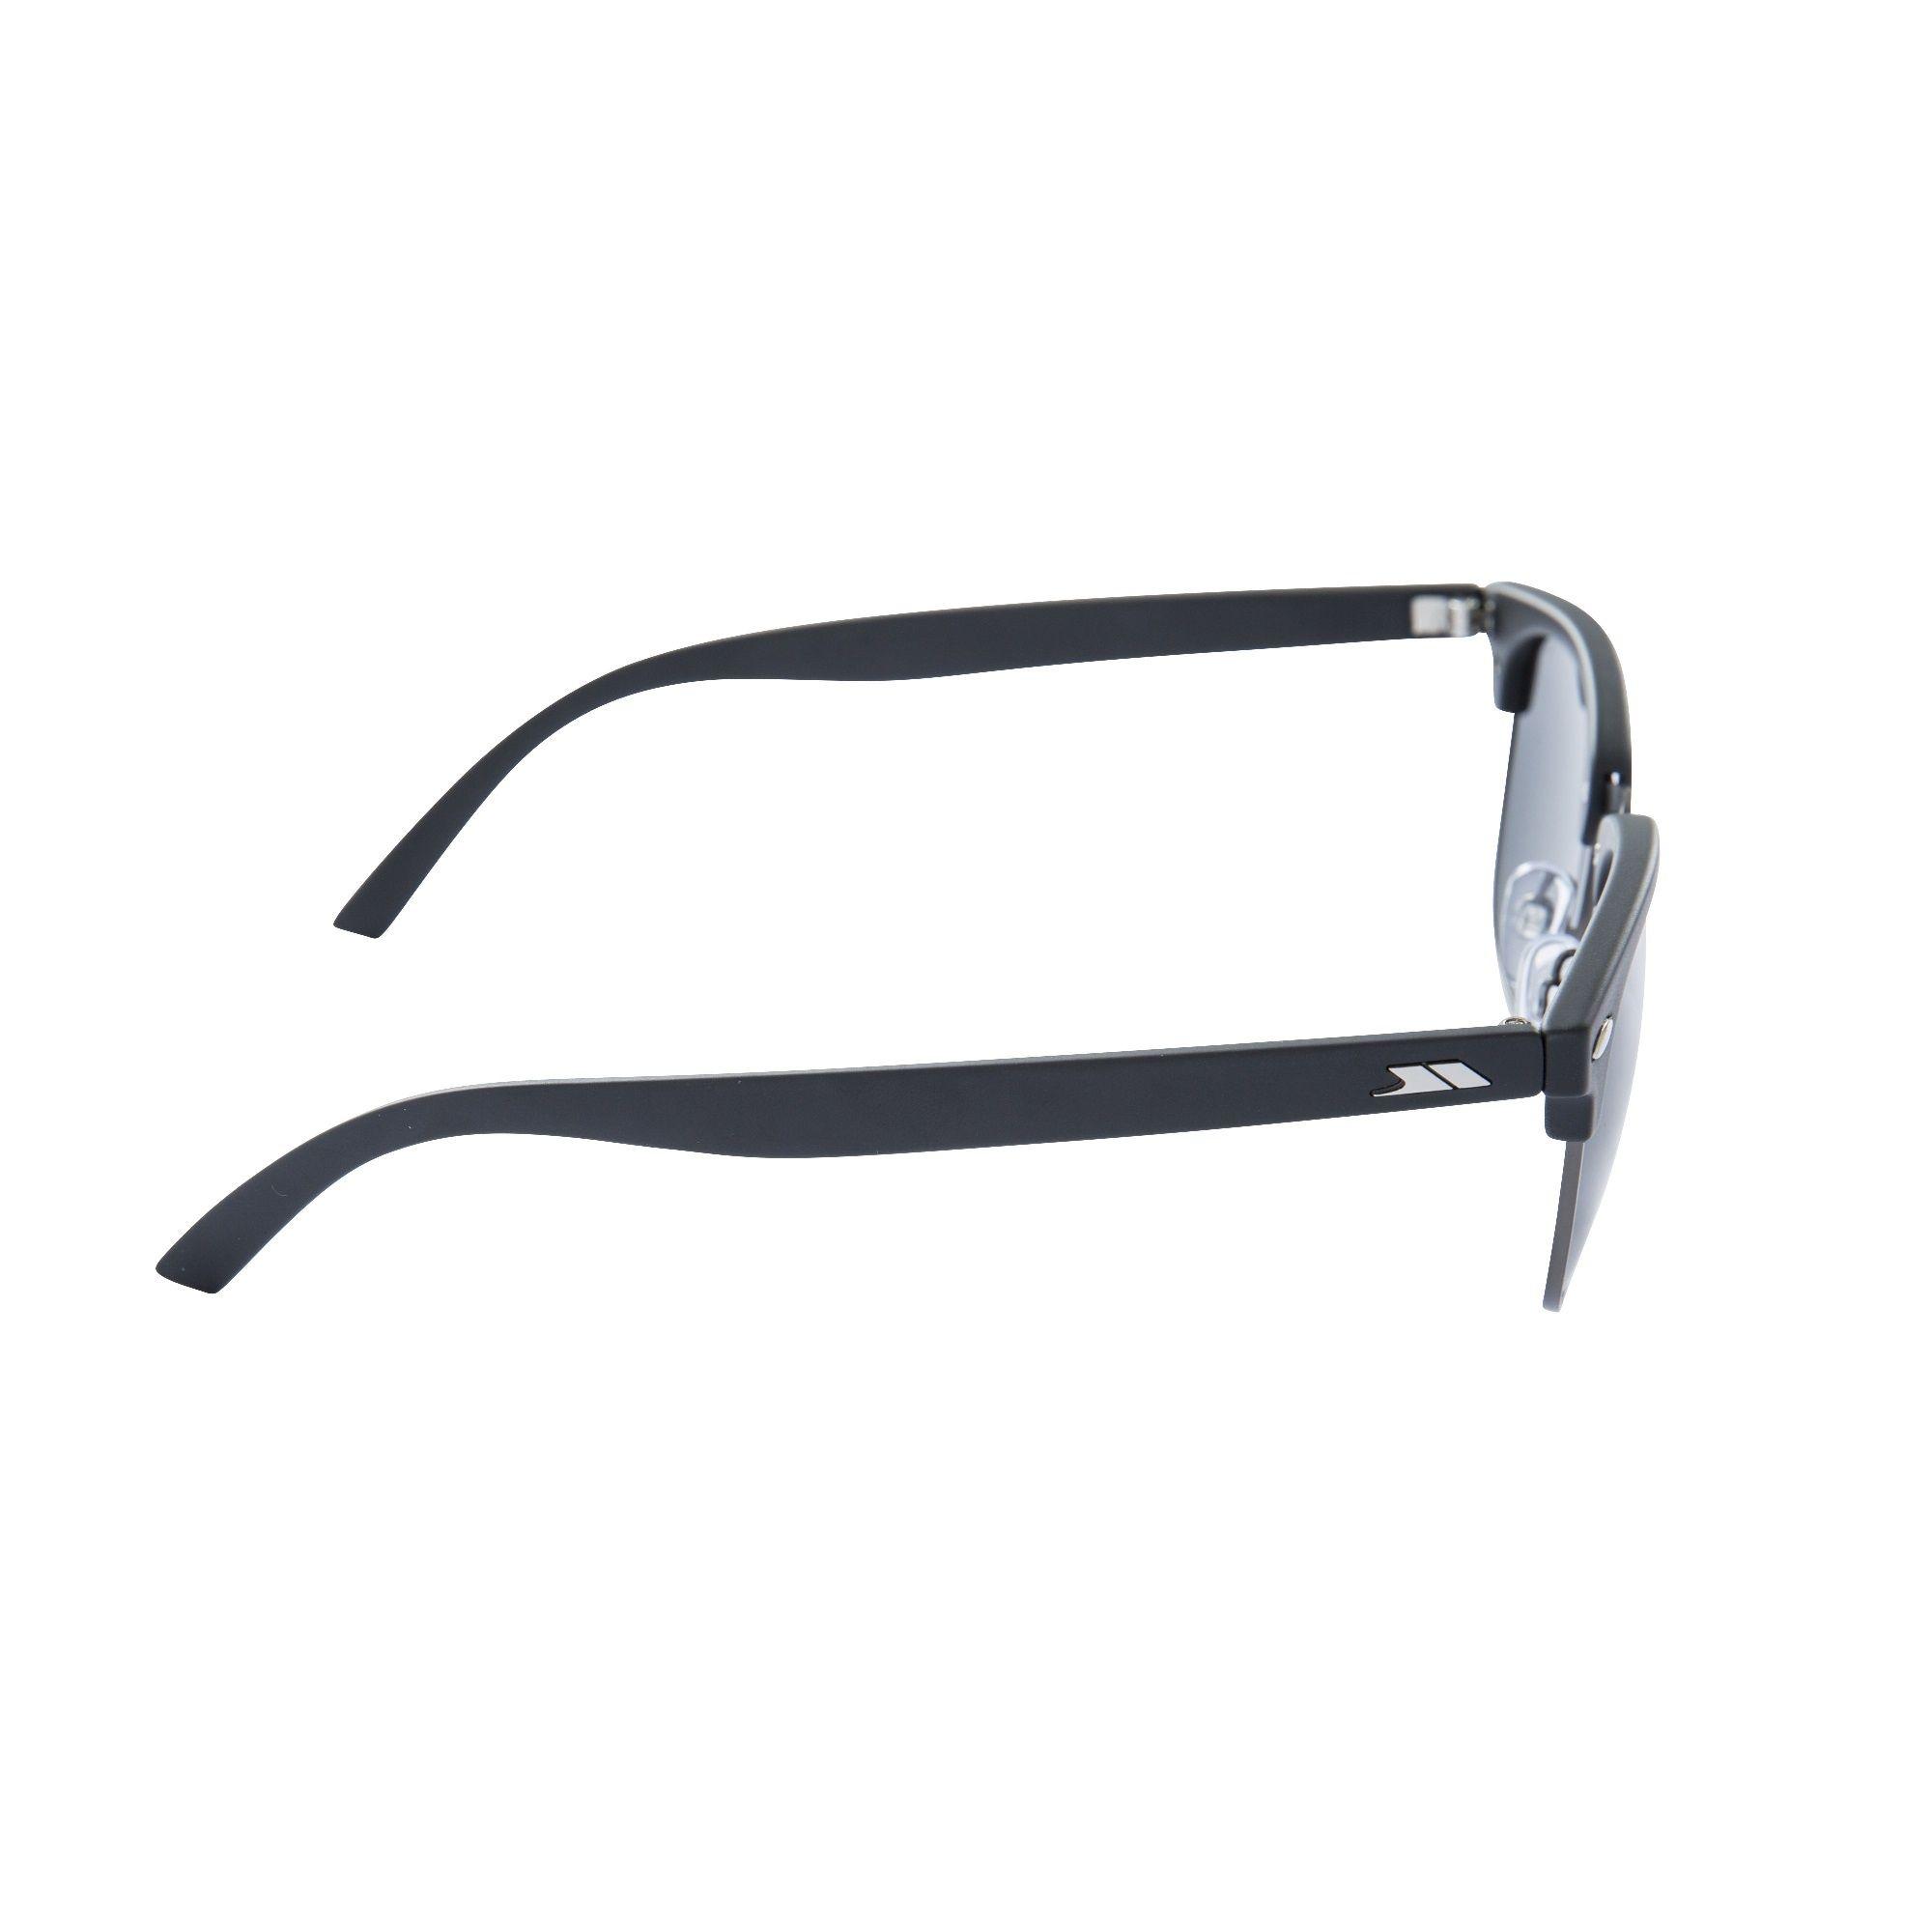 Trespass Unisex Adults Fest Sunglasses